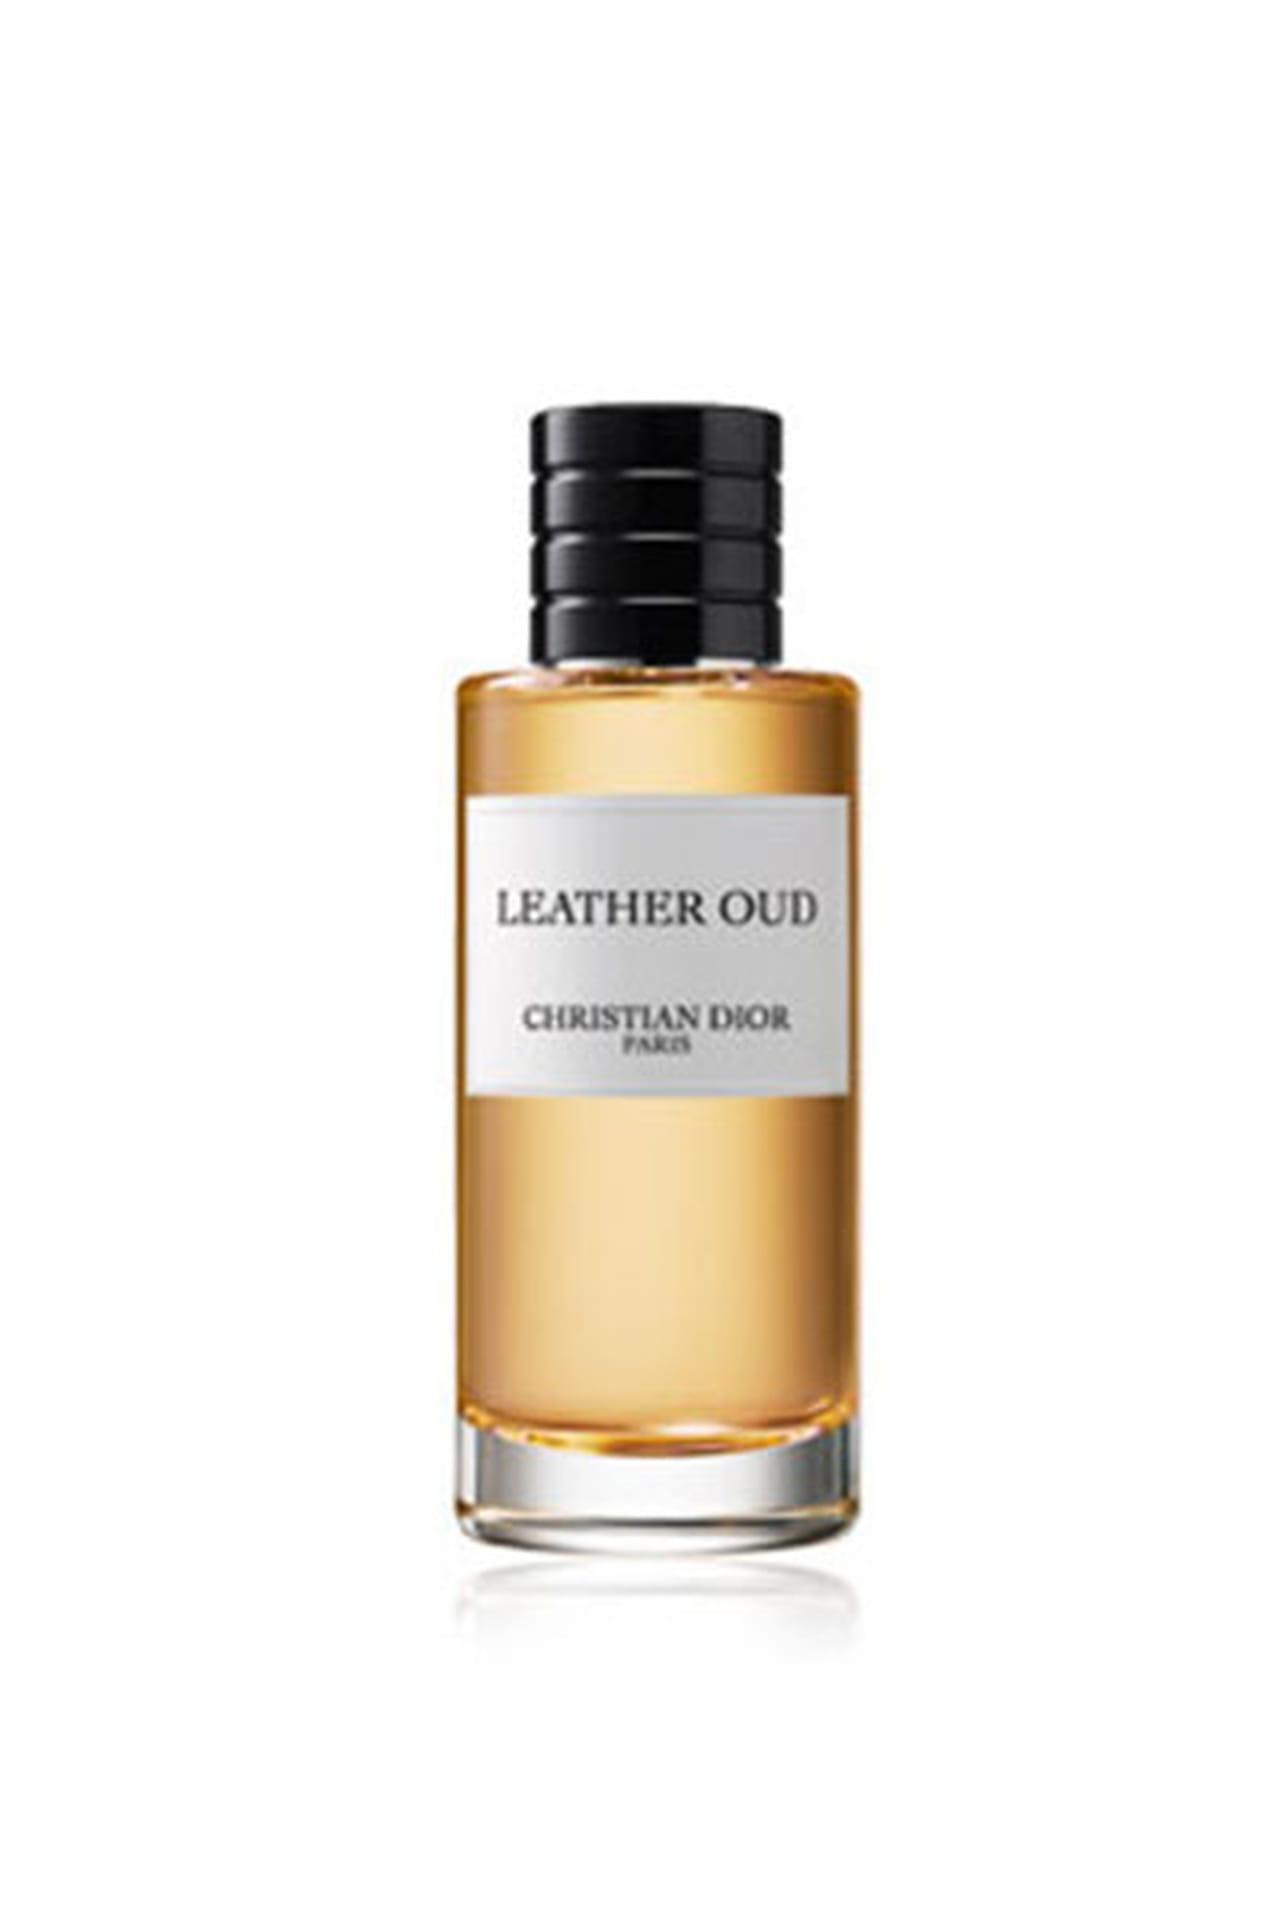 8e5afe093 Christian Dior يقدم عطر الرجل المميز Leather Oud